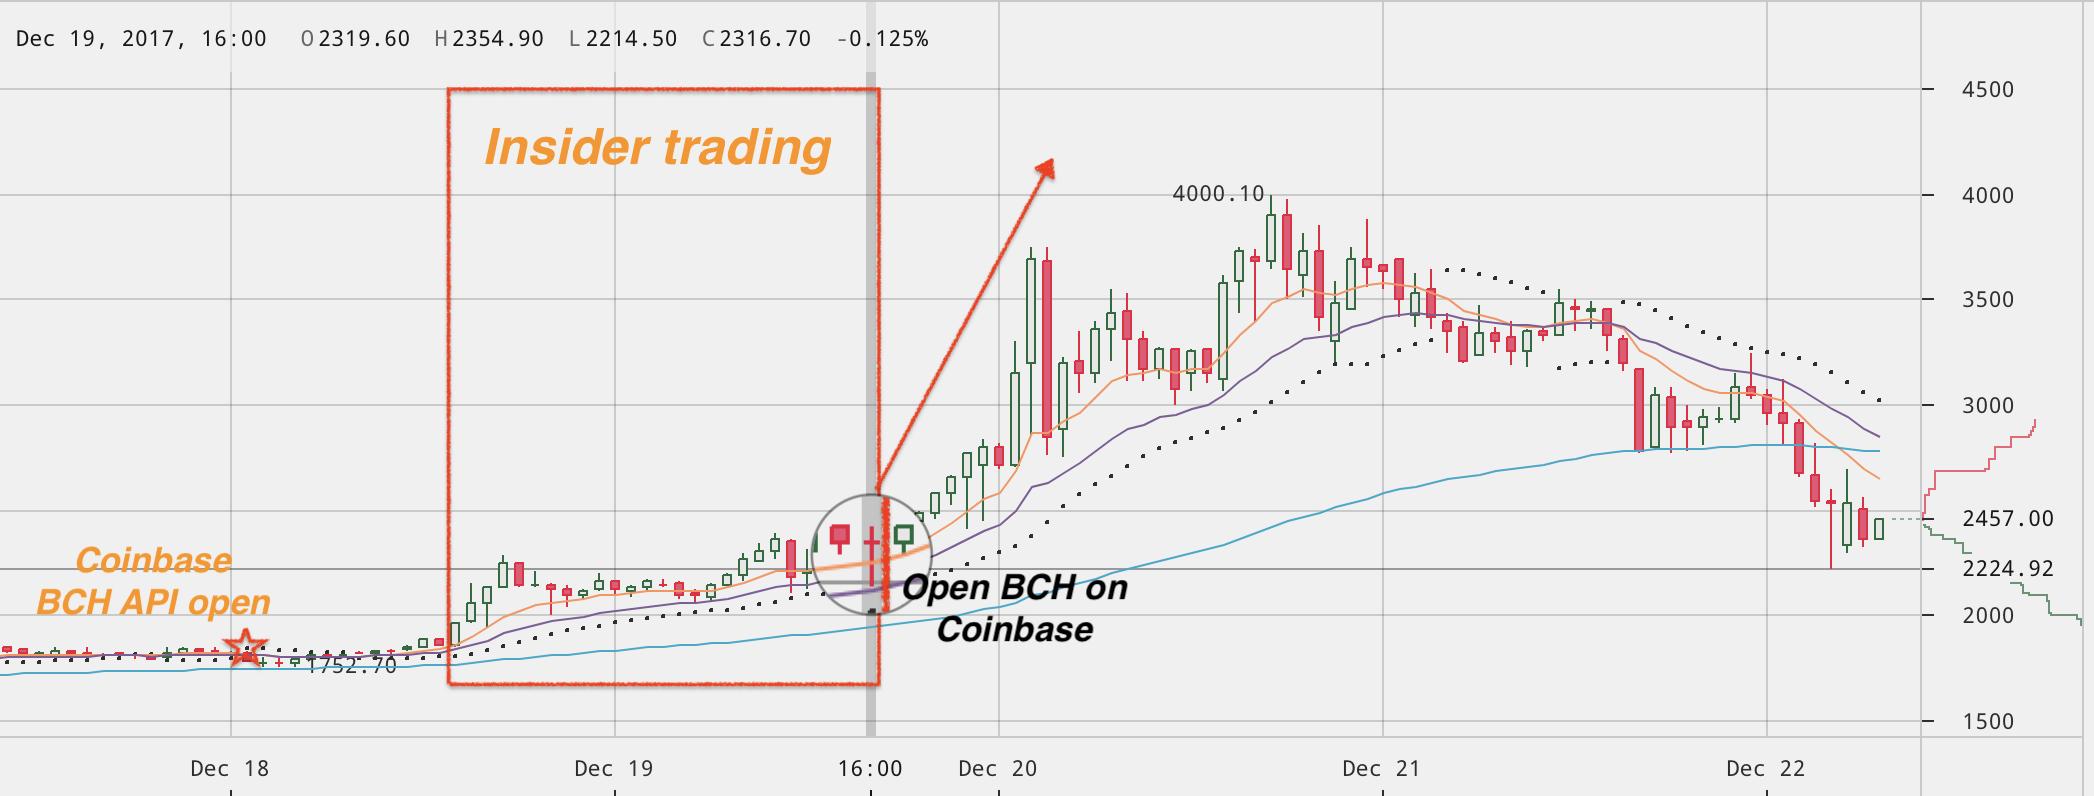 coinbase_inside_trading